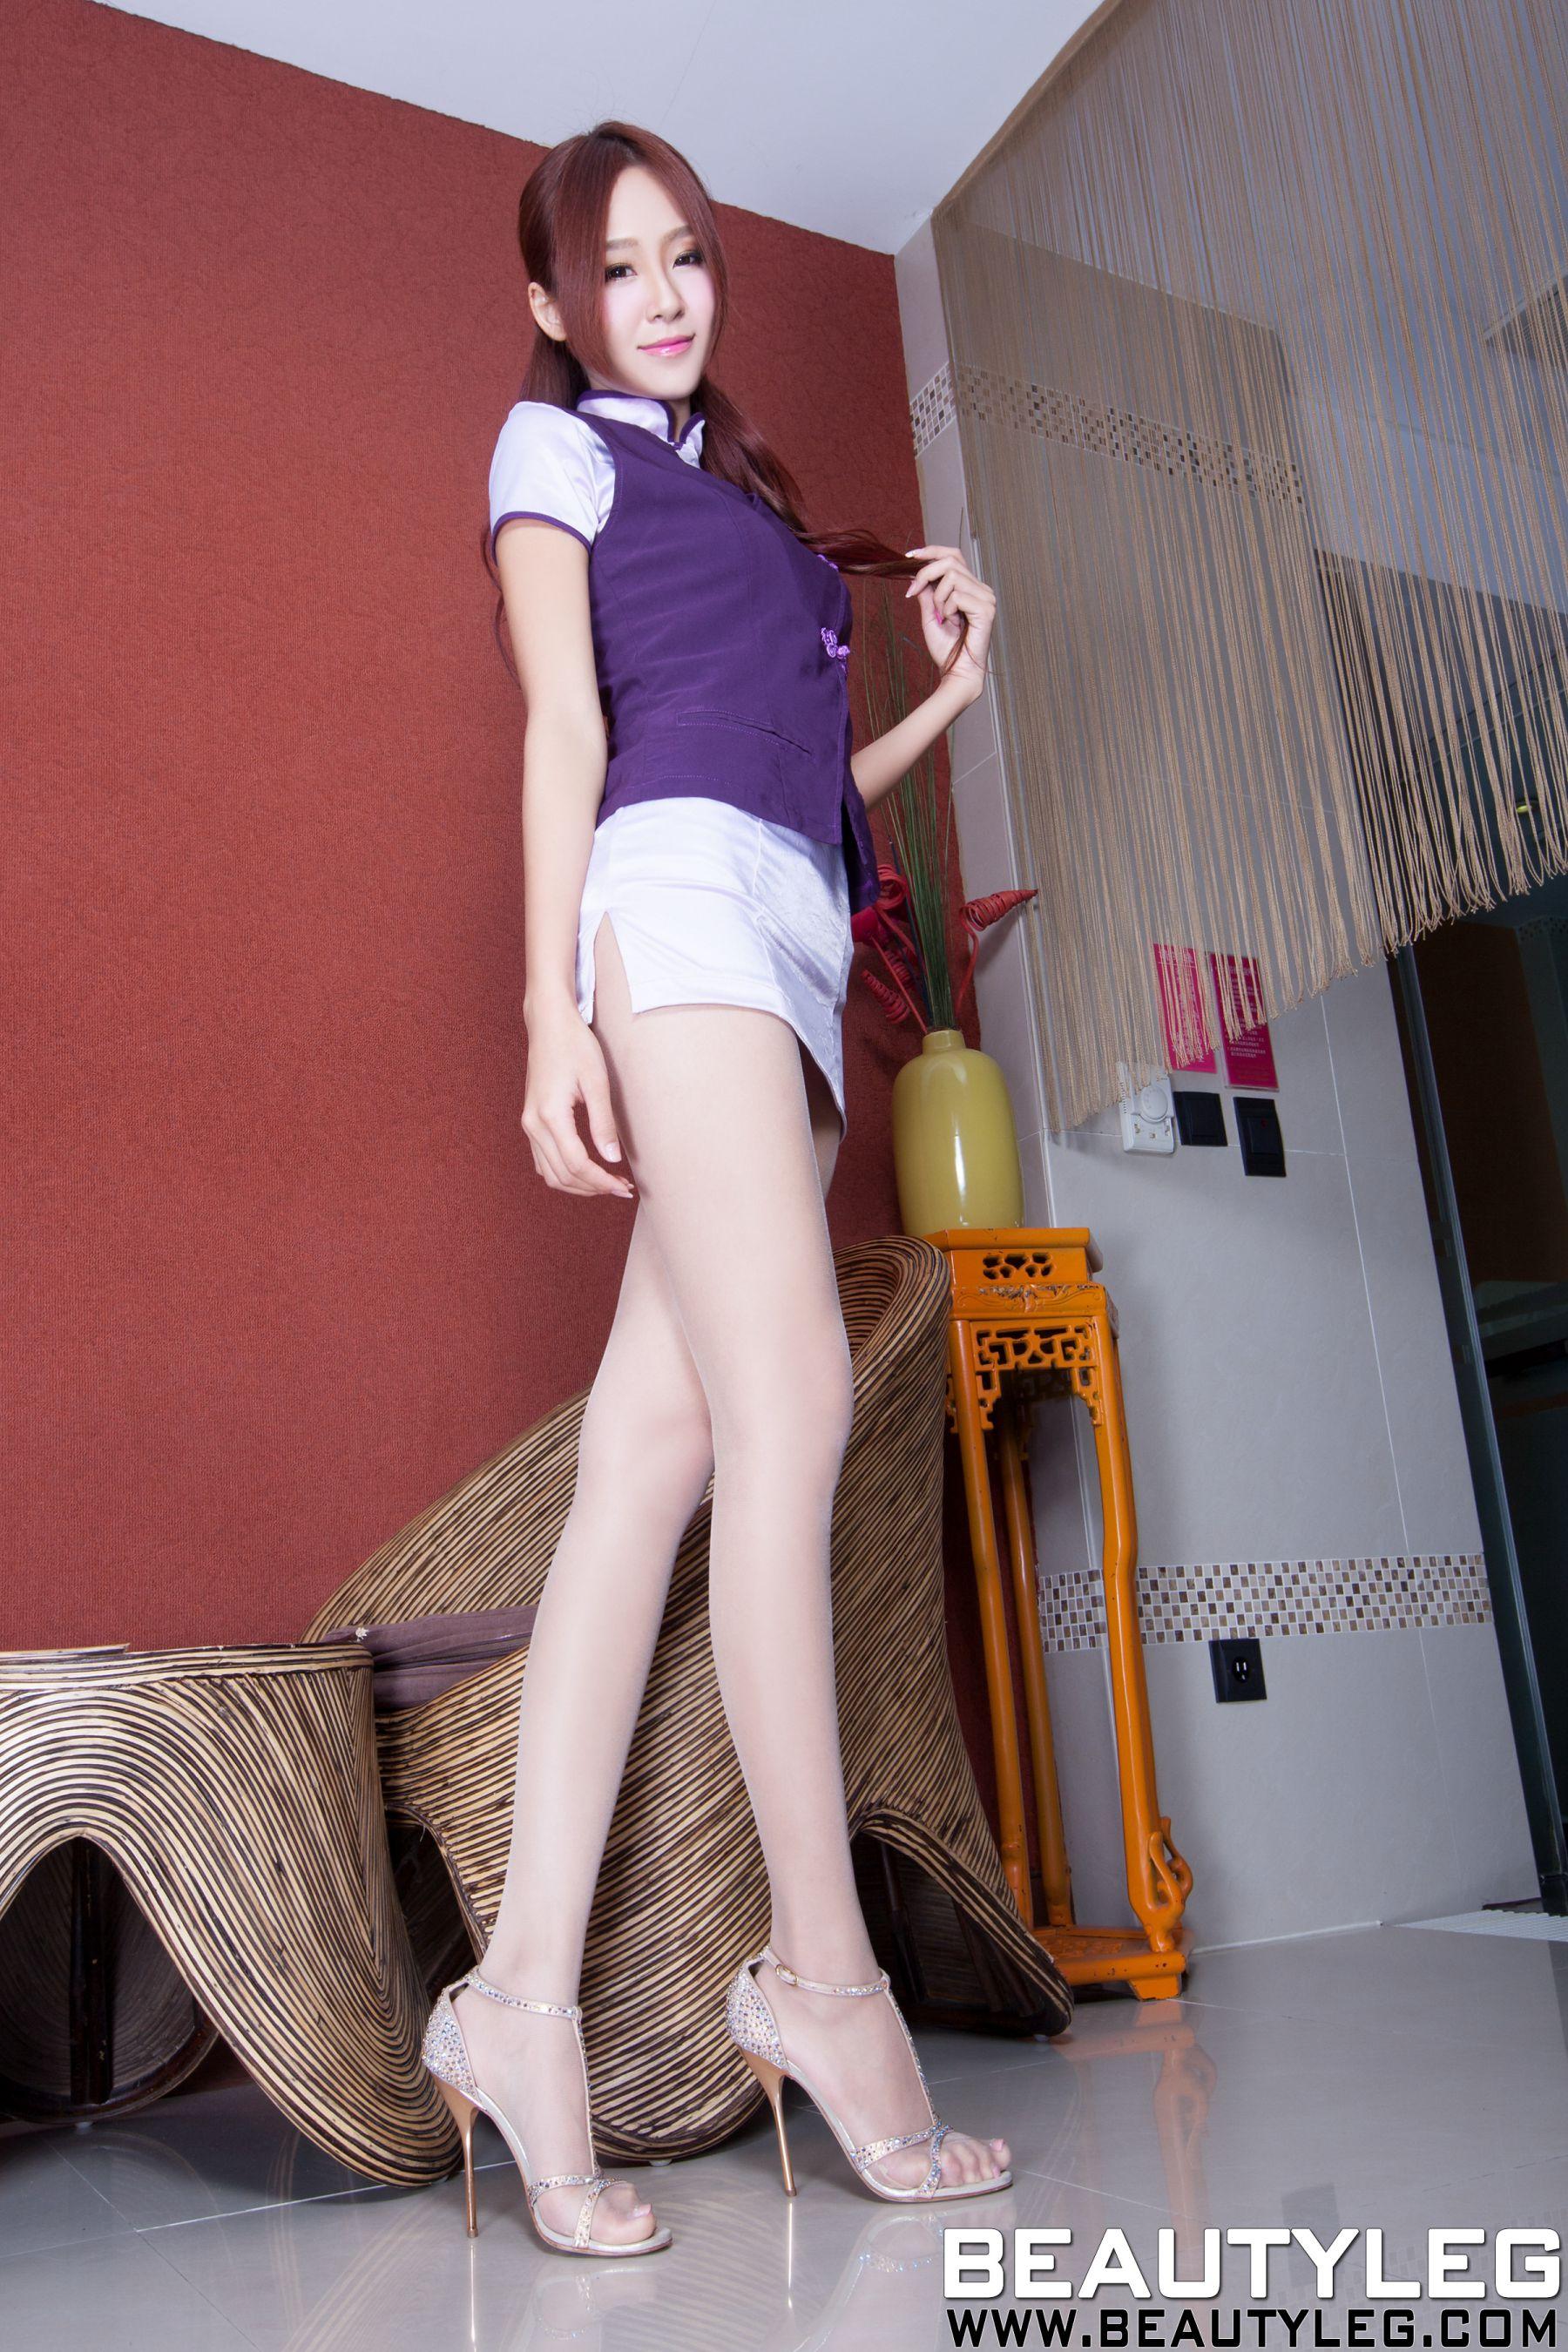 VOL.286 [Beautyleg]高跟美腿:Winnie小雪(庄咏惠,庄温妮,腿模Winnie)高品质写真套图(57P)